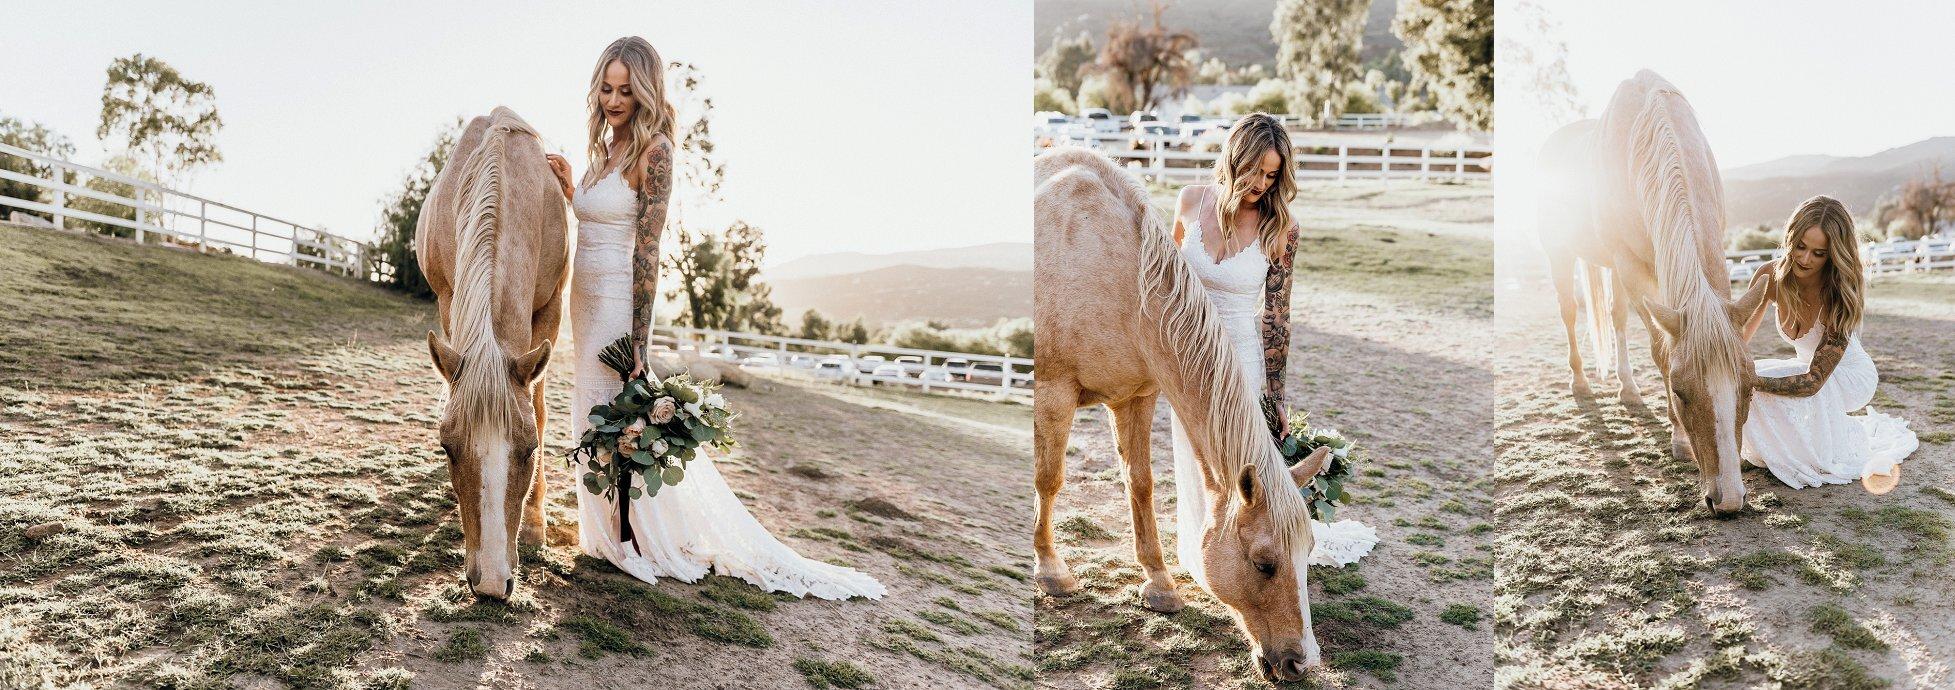 San Diego Wedding Photography La Bonita Ranch_0126.jpg